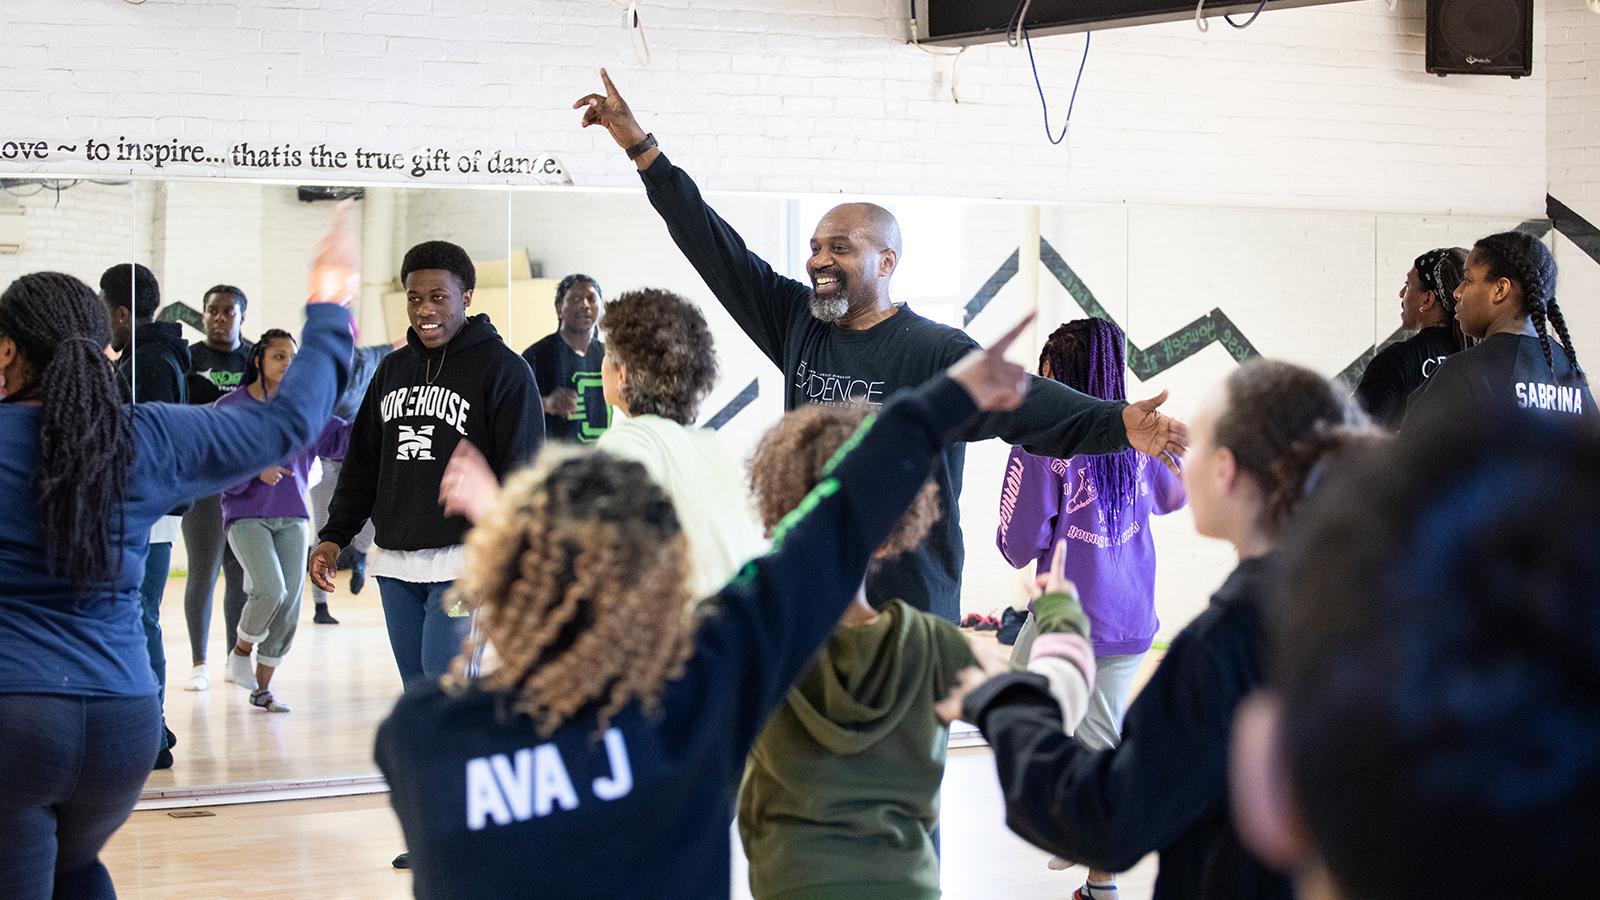 [Ronald K. Brown / EvidenceCommunity Dance Class] Photo by Chris Kayden